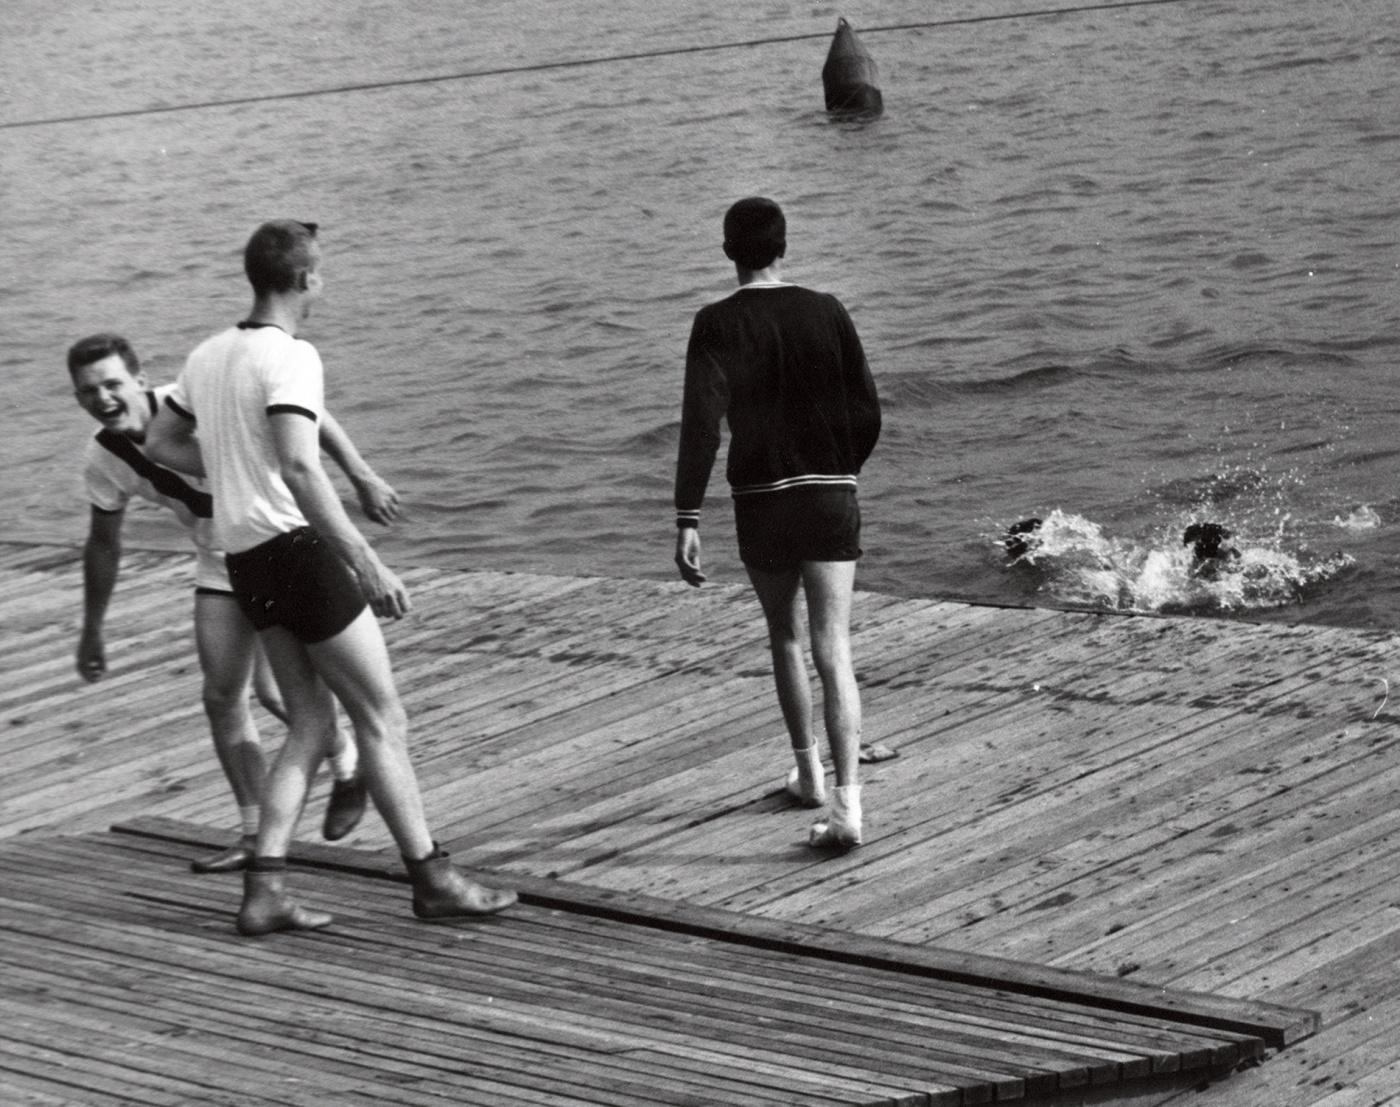 1960 crew coxswain toss